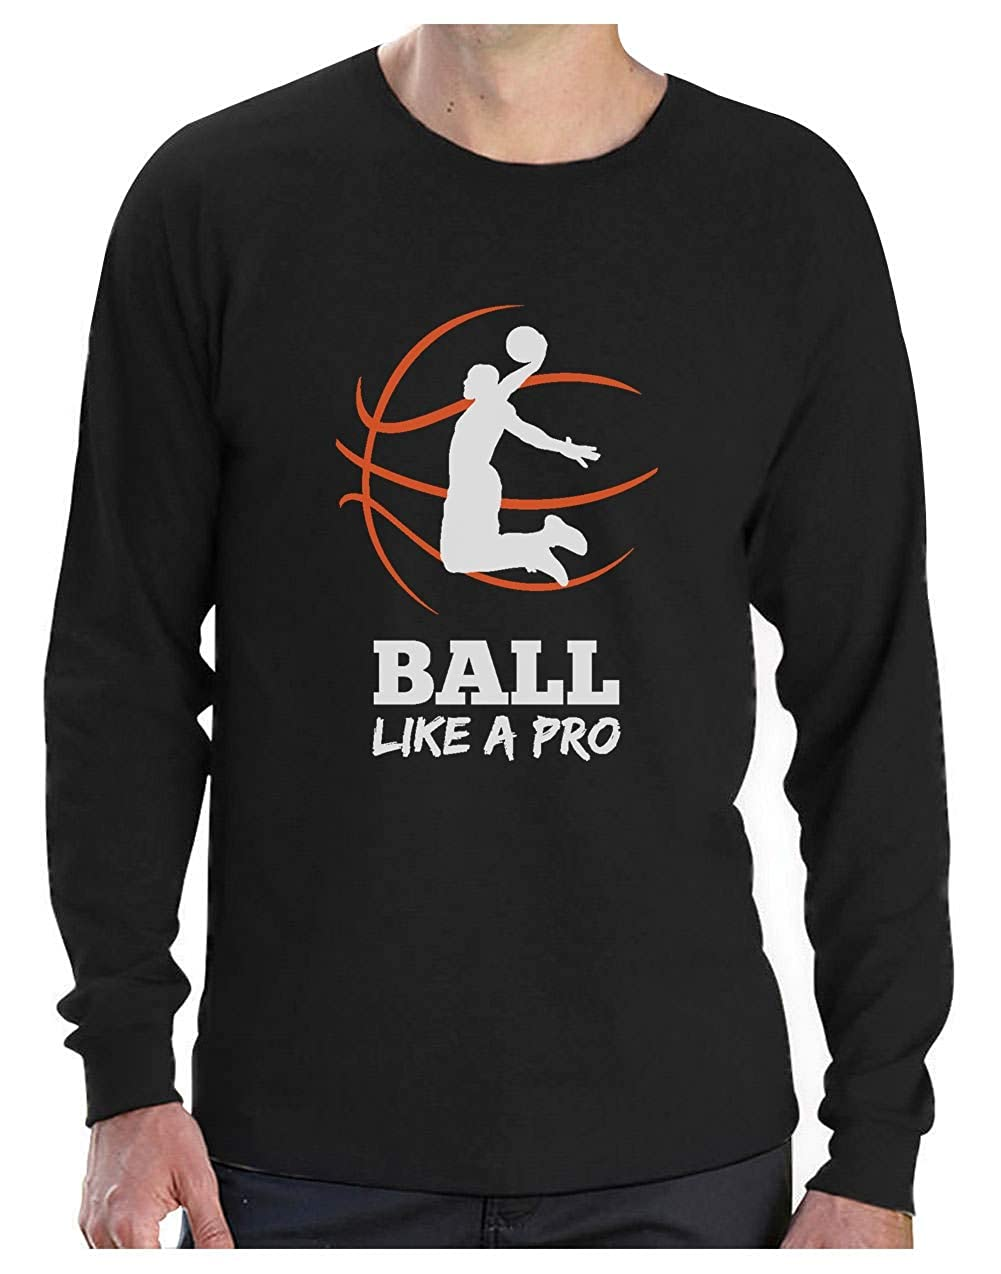 Camiseta de Manga Larga para Hombre- Baloncesto Regalos Originales ...